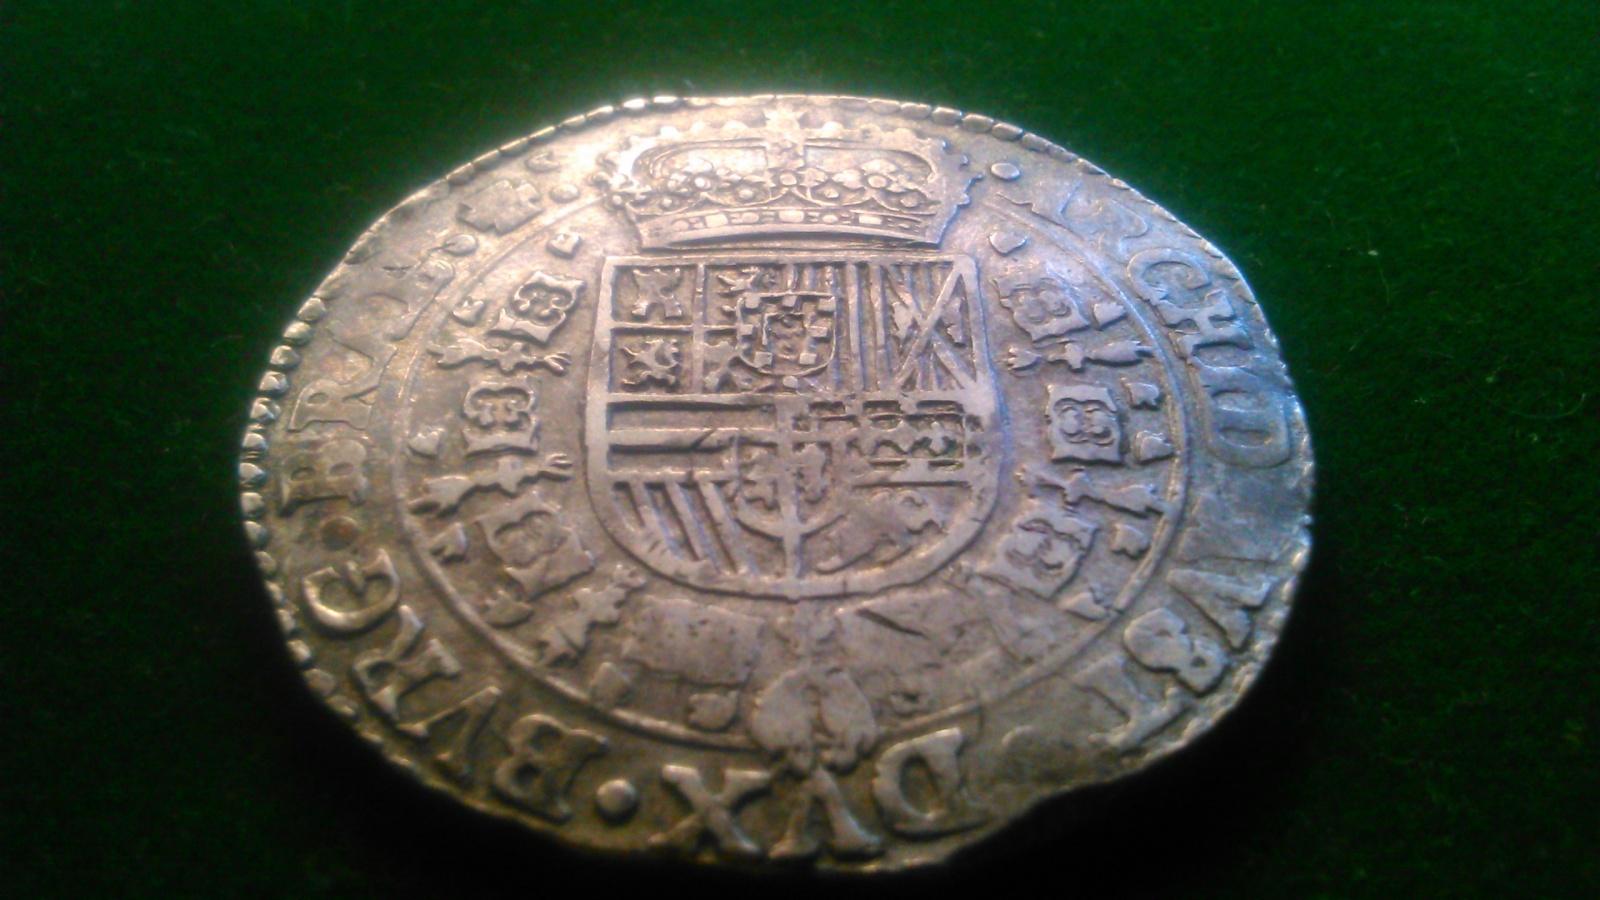 1 Patagón. Felipe IV 1654 Amberes. Dedicada a Lanzarote 2z5ueco